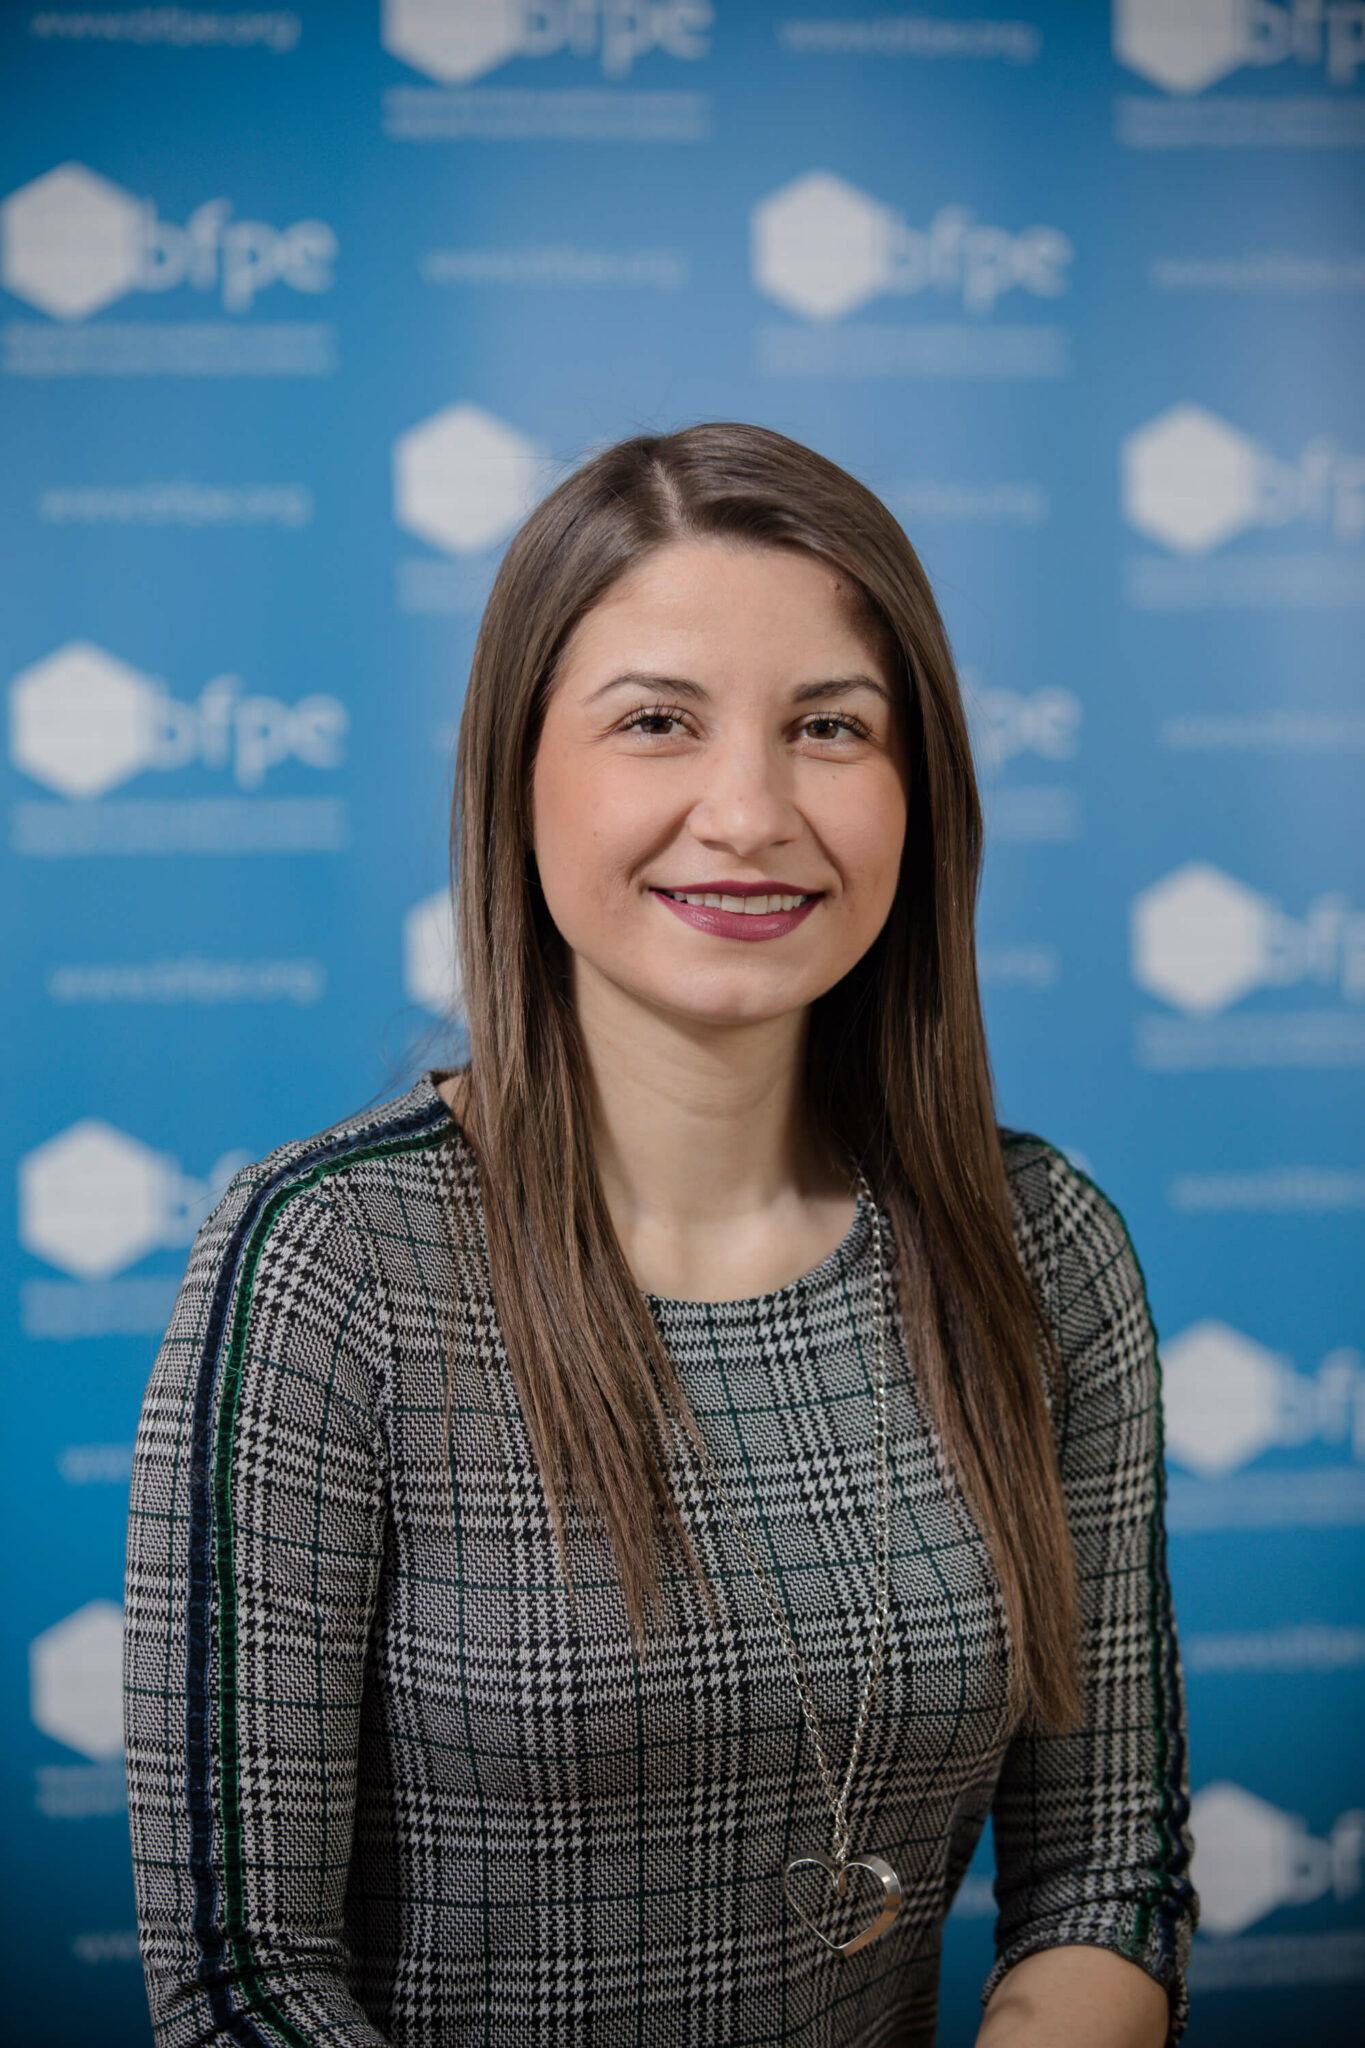 Lidija Radulović